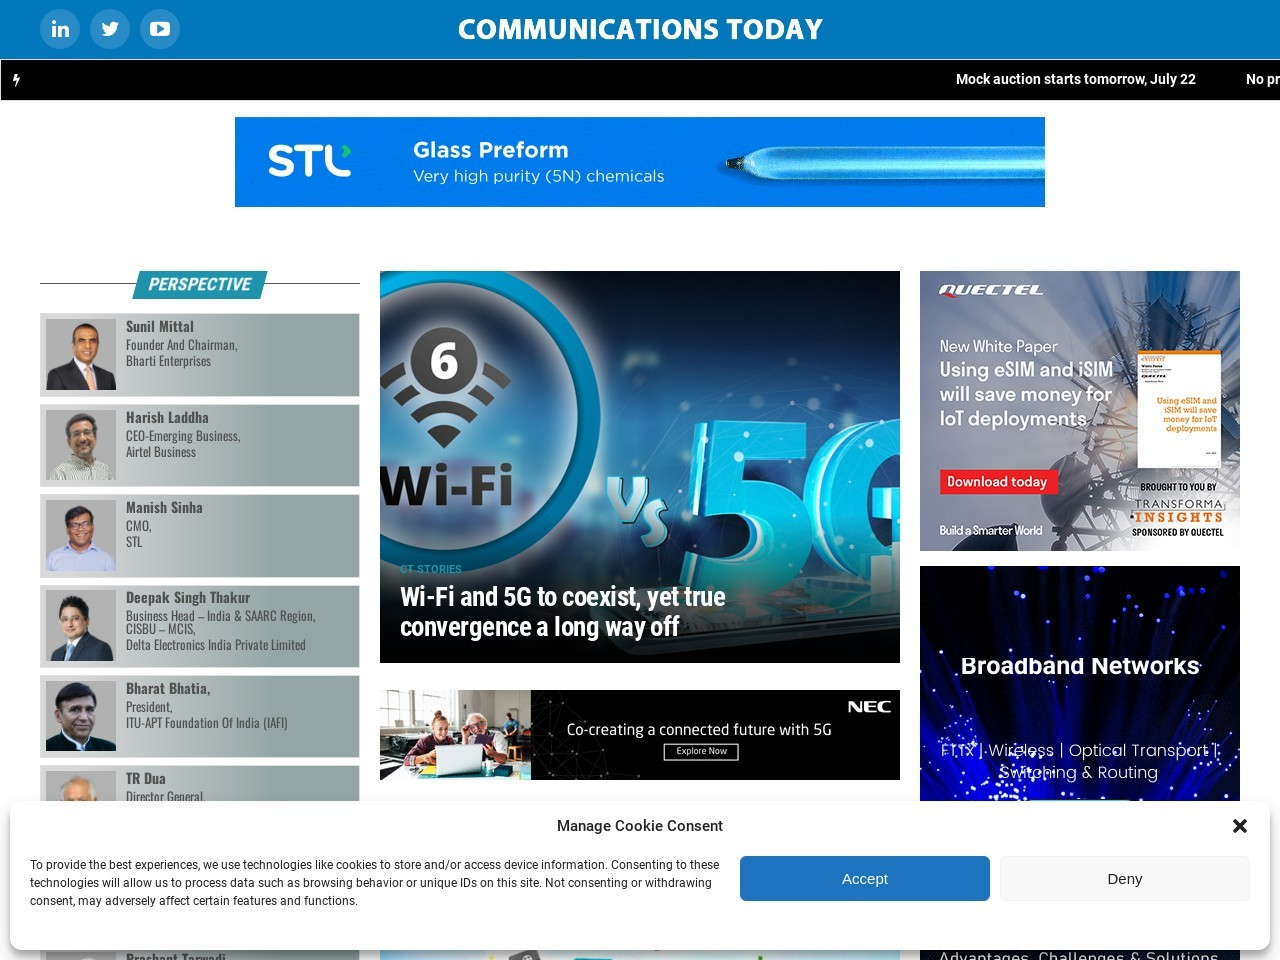 PLI scheme a signal boost for telecom sector, Crisil